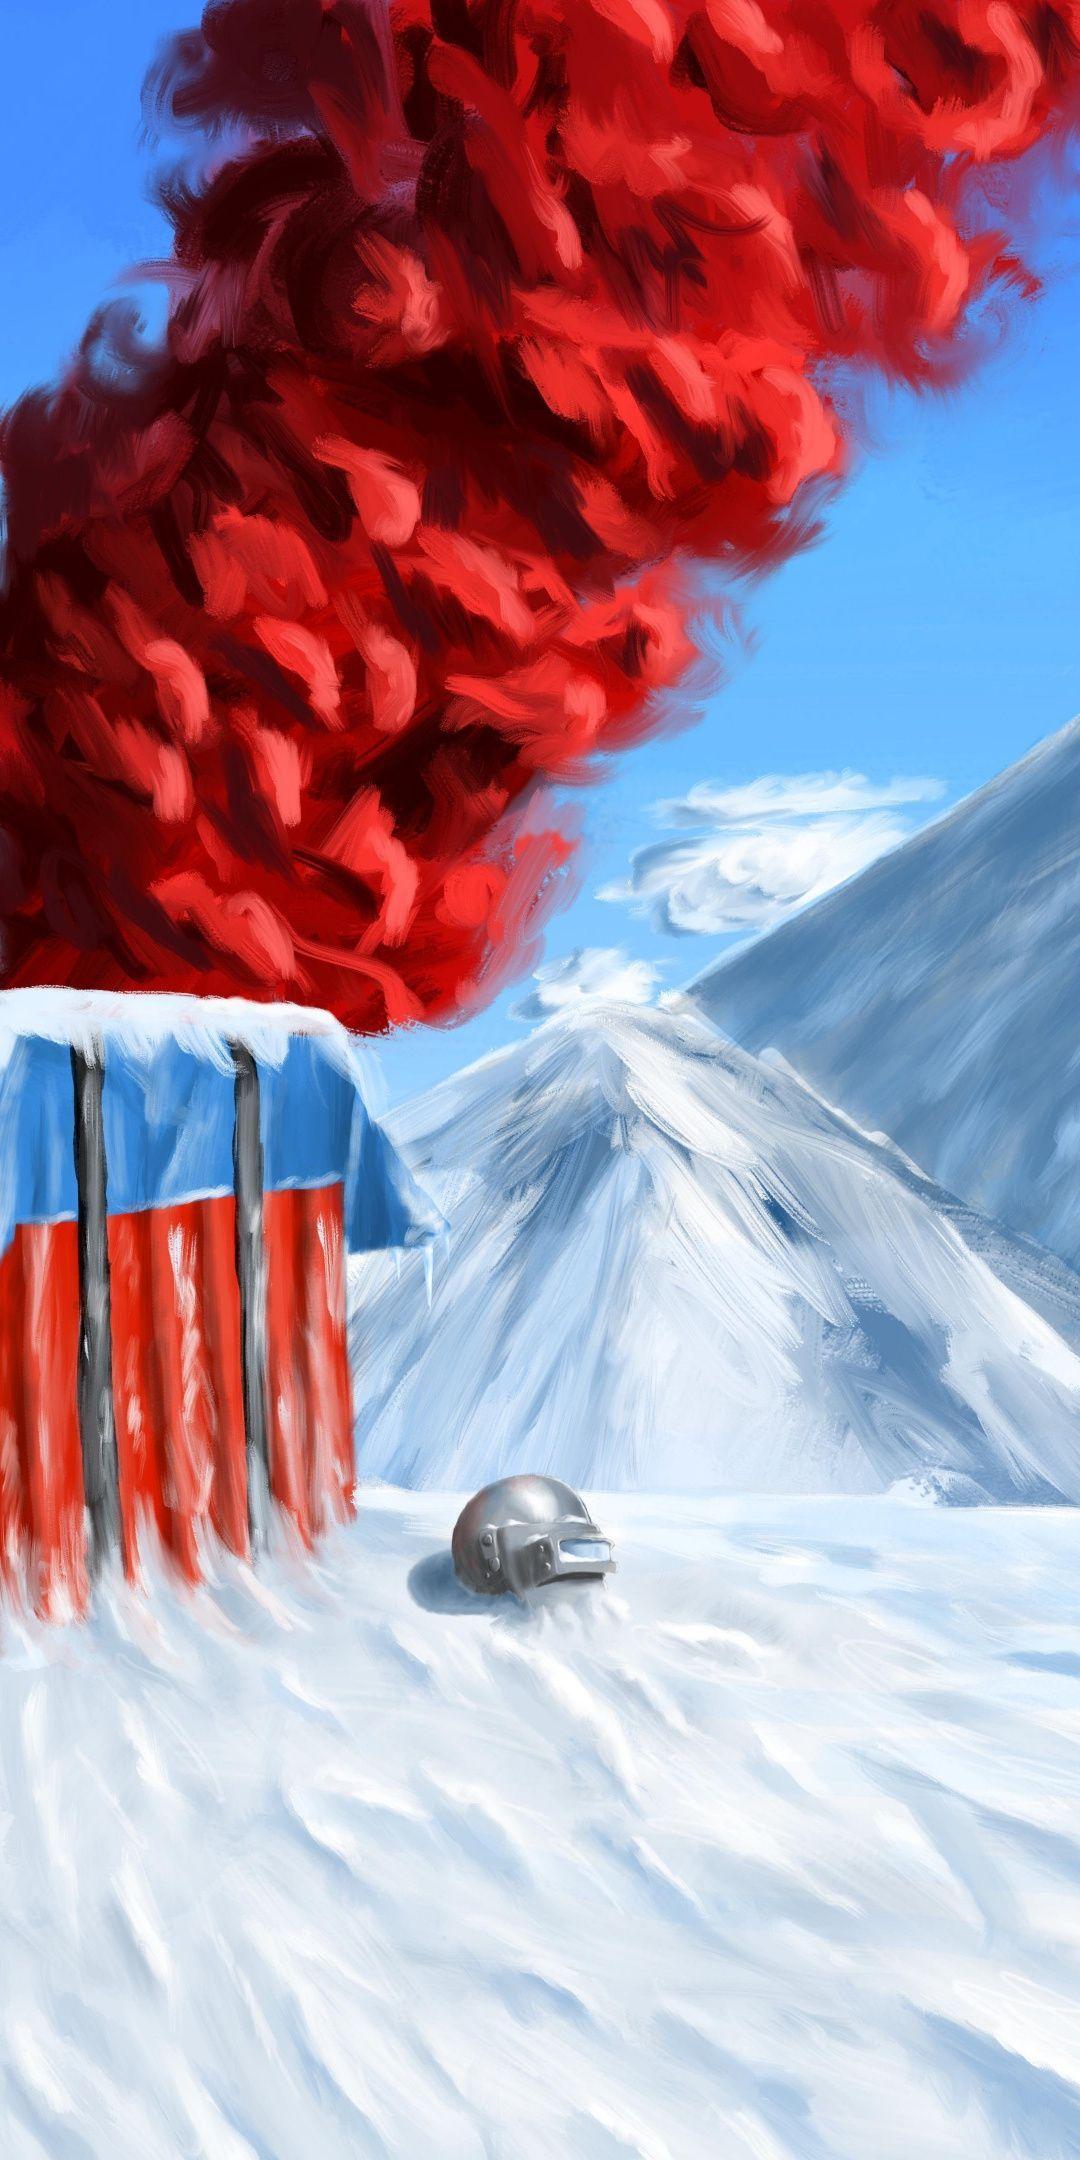 PUBG, winter, mountains, landscape, red smoke, art